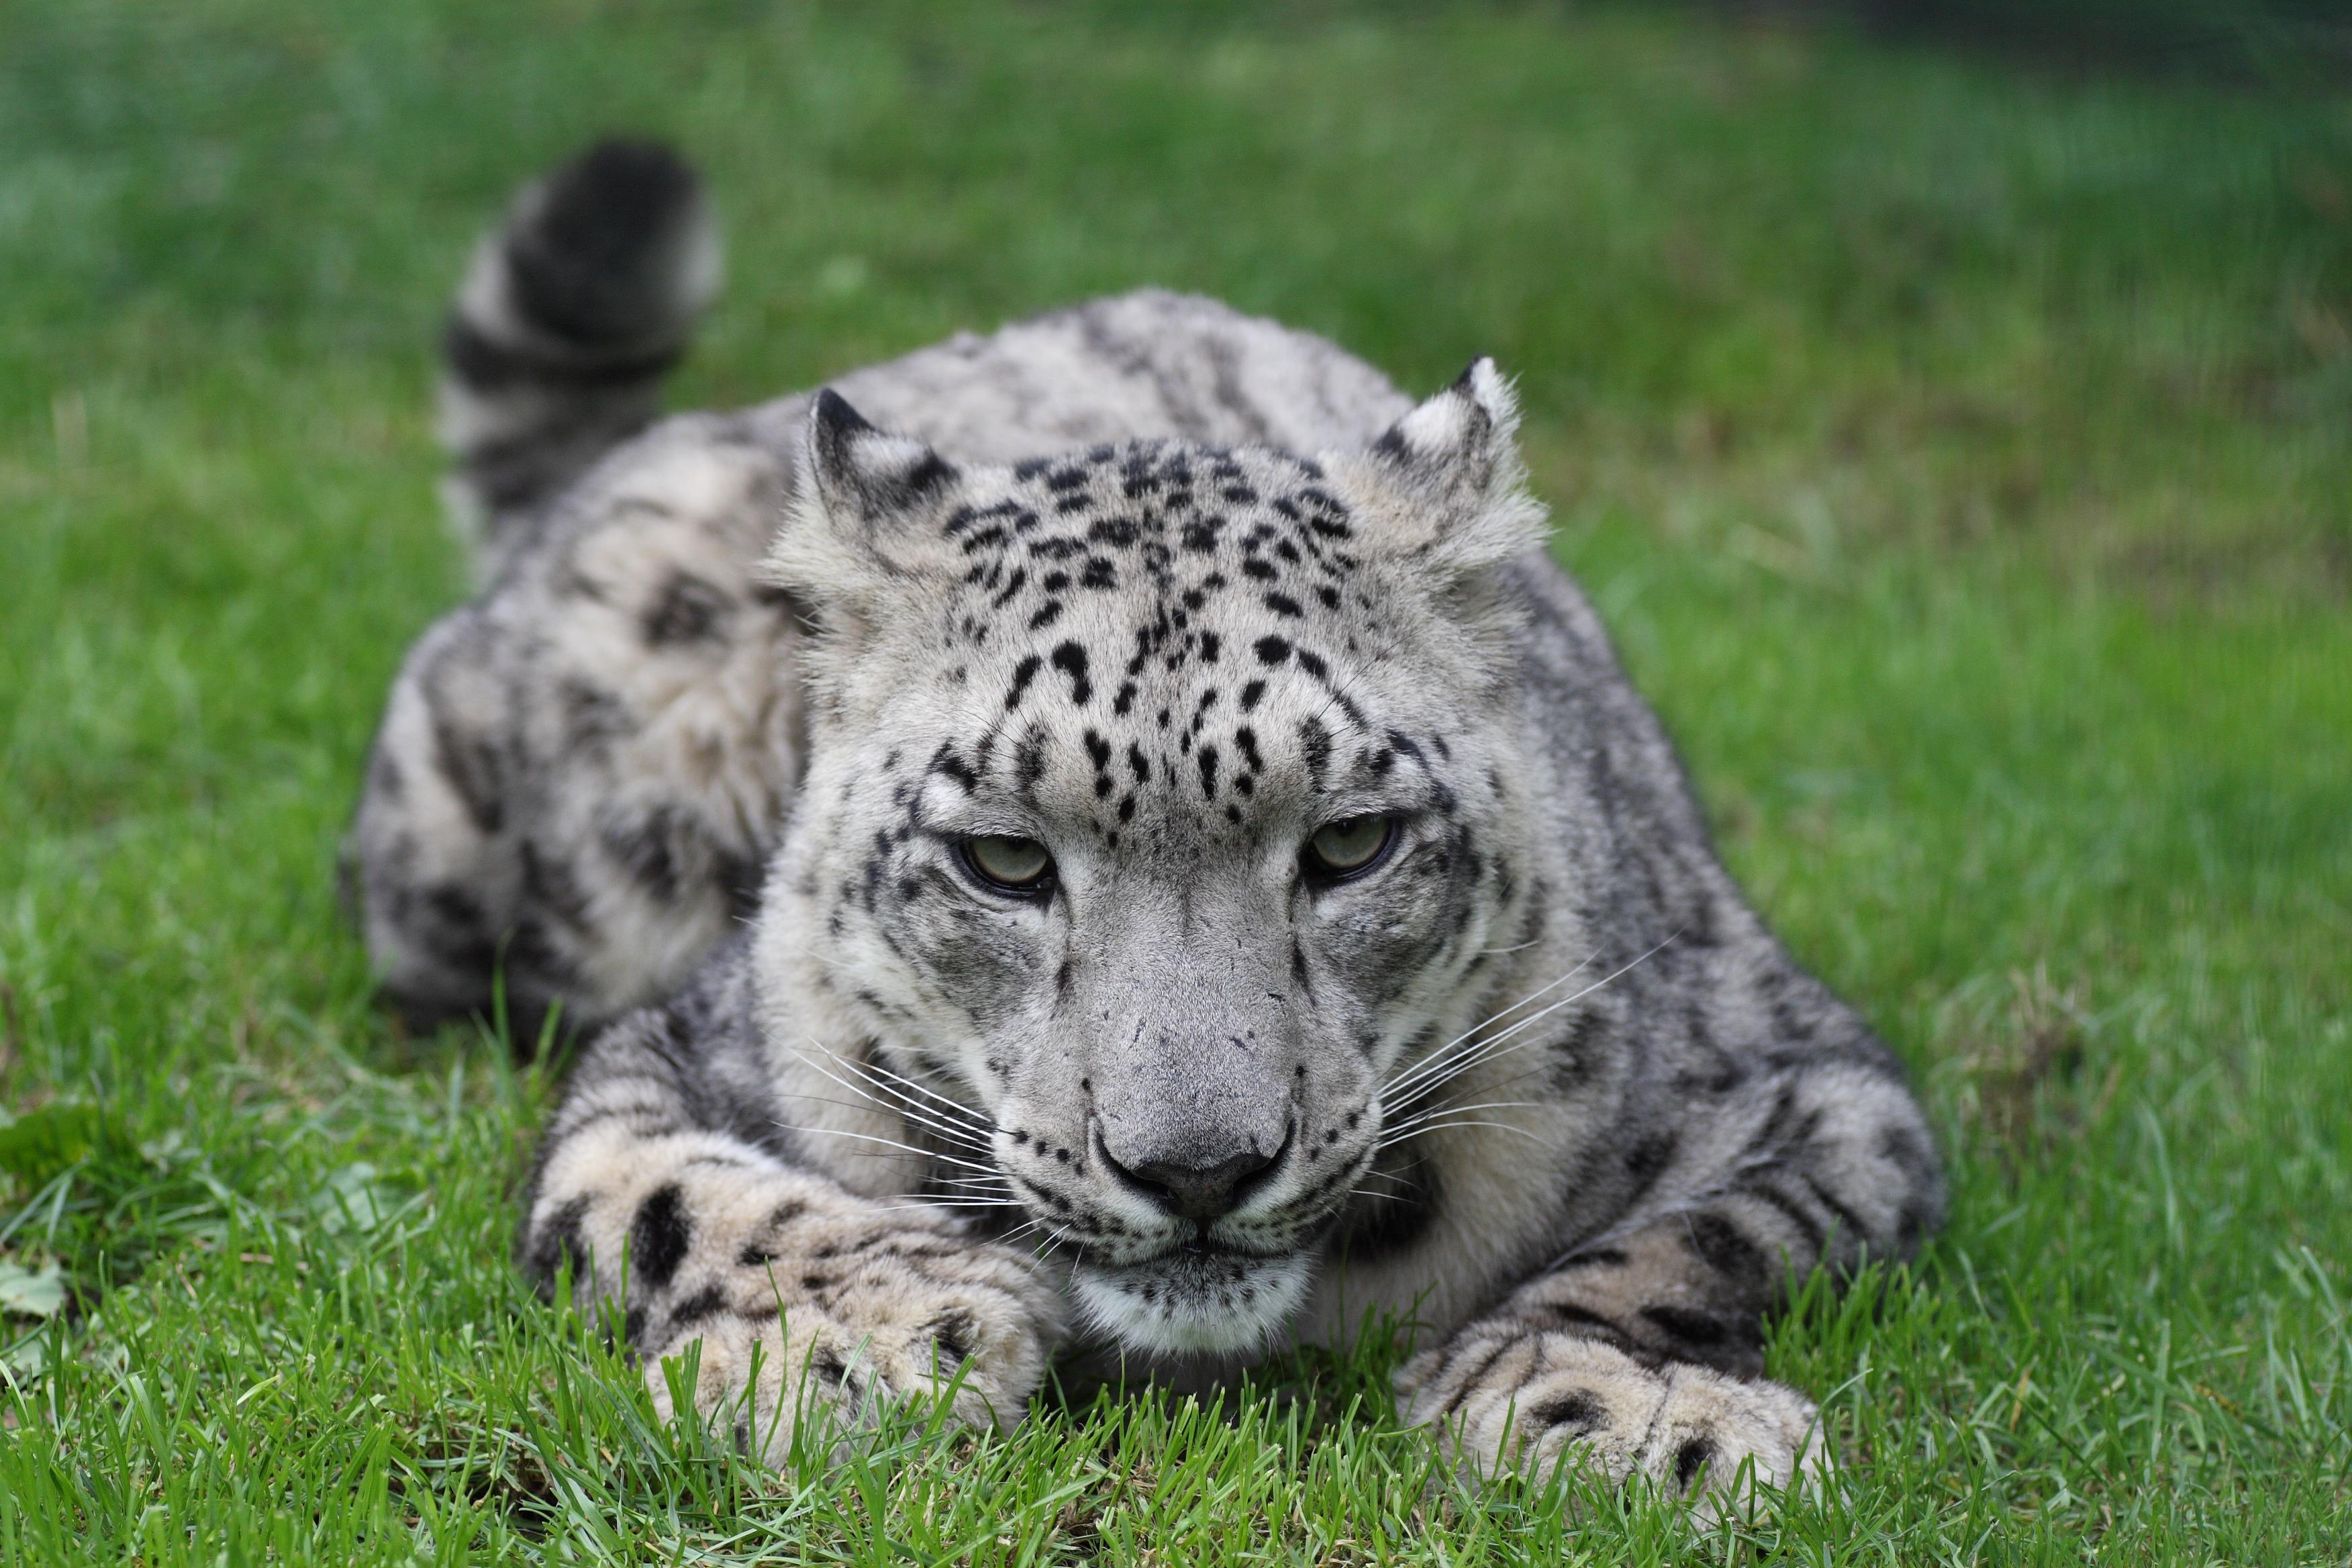 Simple Wallpaper Mac Snow Leopard - 116969  2018_475474.jpg